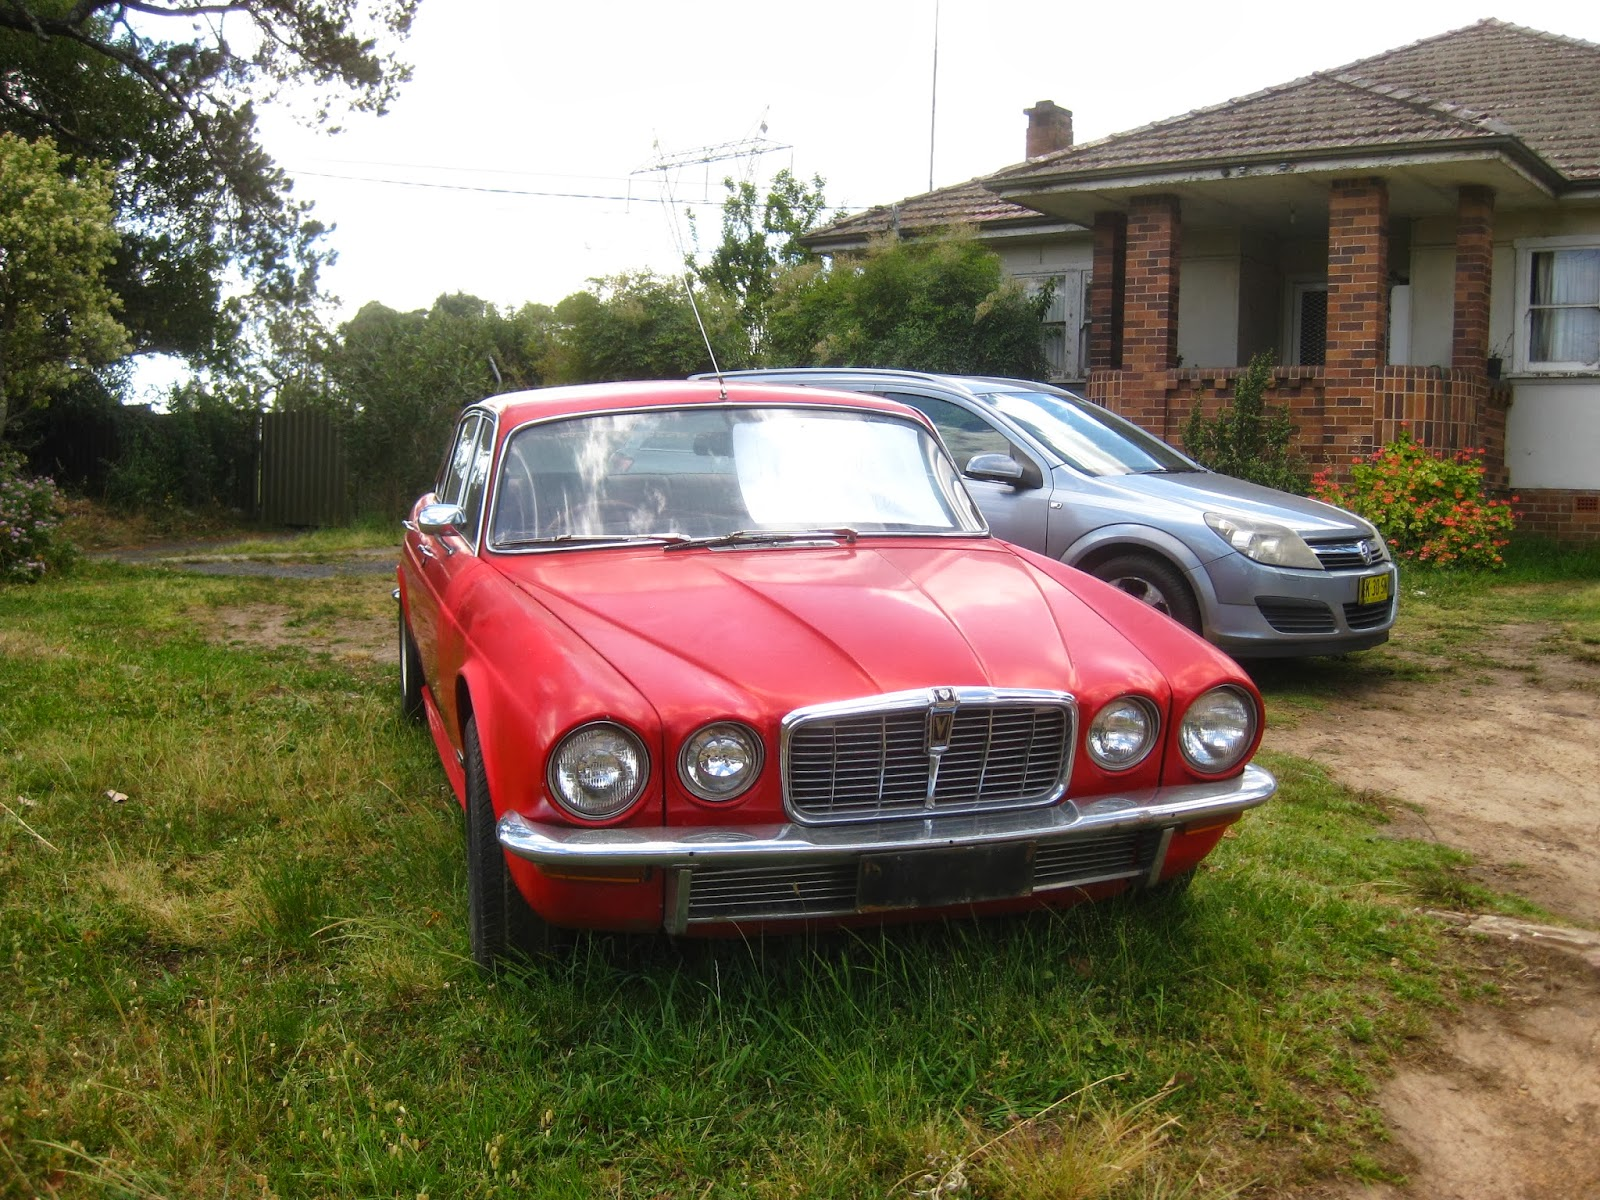 Aussie Old Parked Cars: 1974 Jaguar XJ12 Series 2